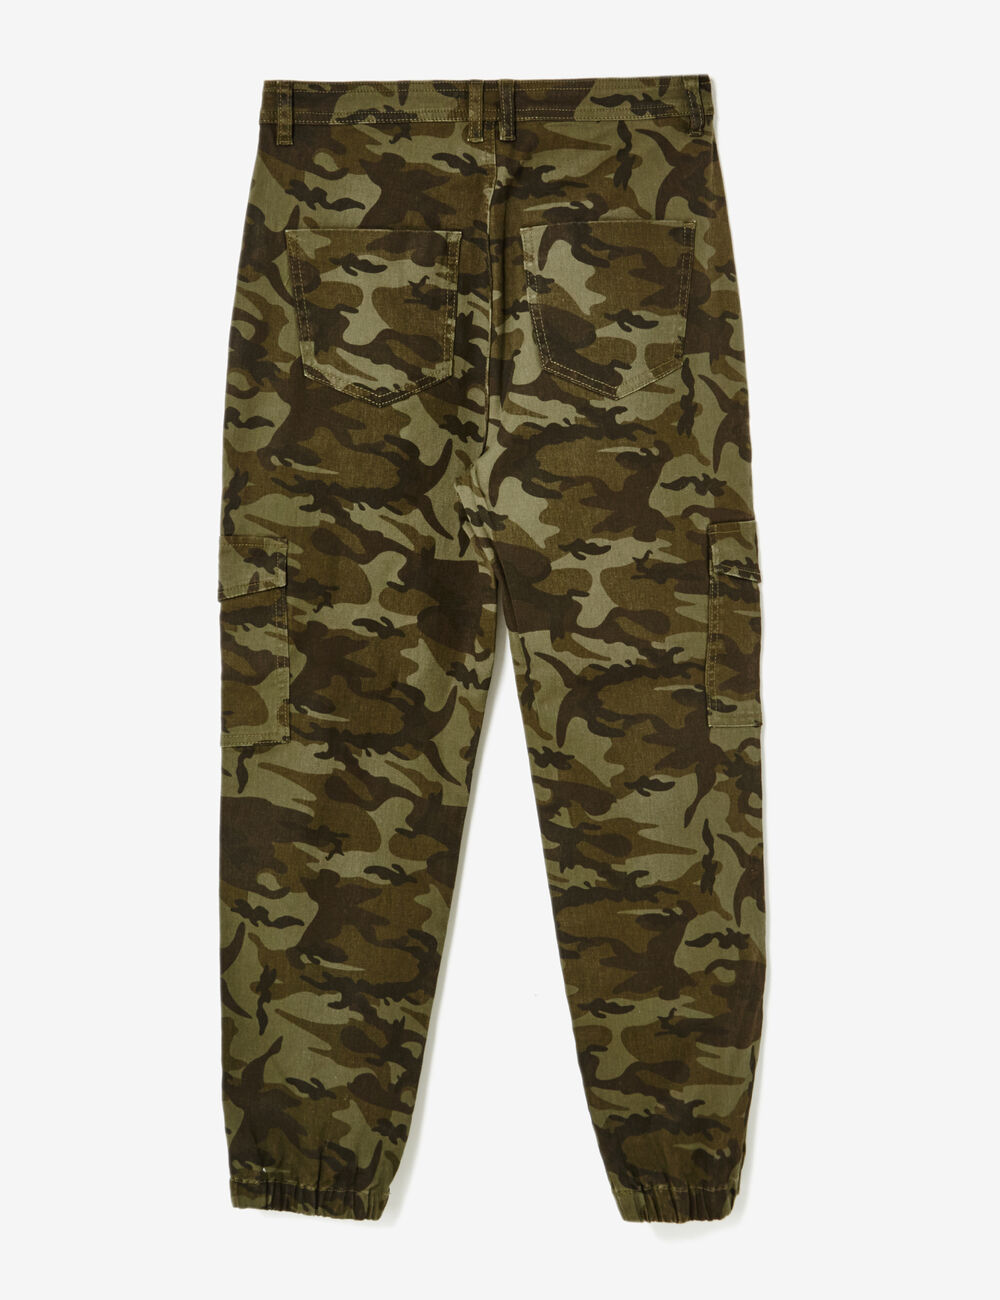 pantalon style baggy camouflage kaki femme jennyfer. Black Bedroom Furniture Sets. Home Design Ideas